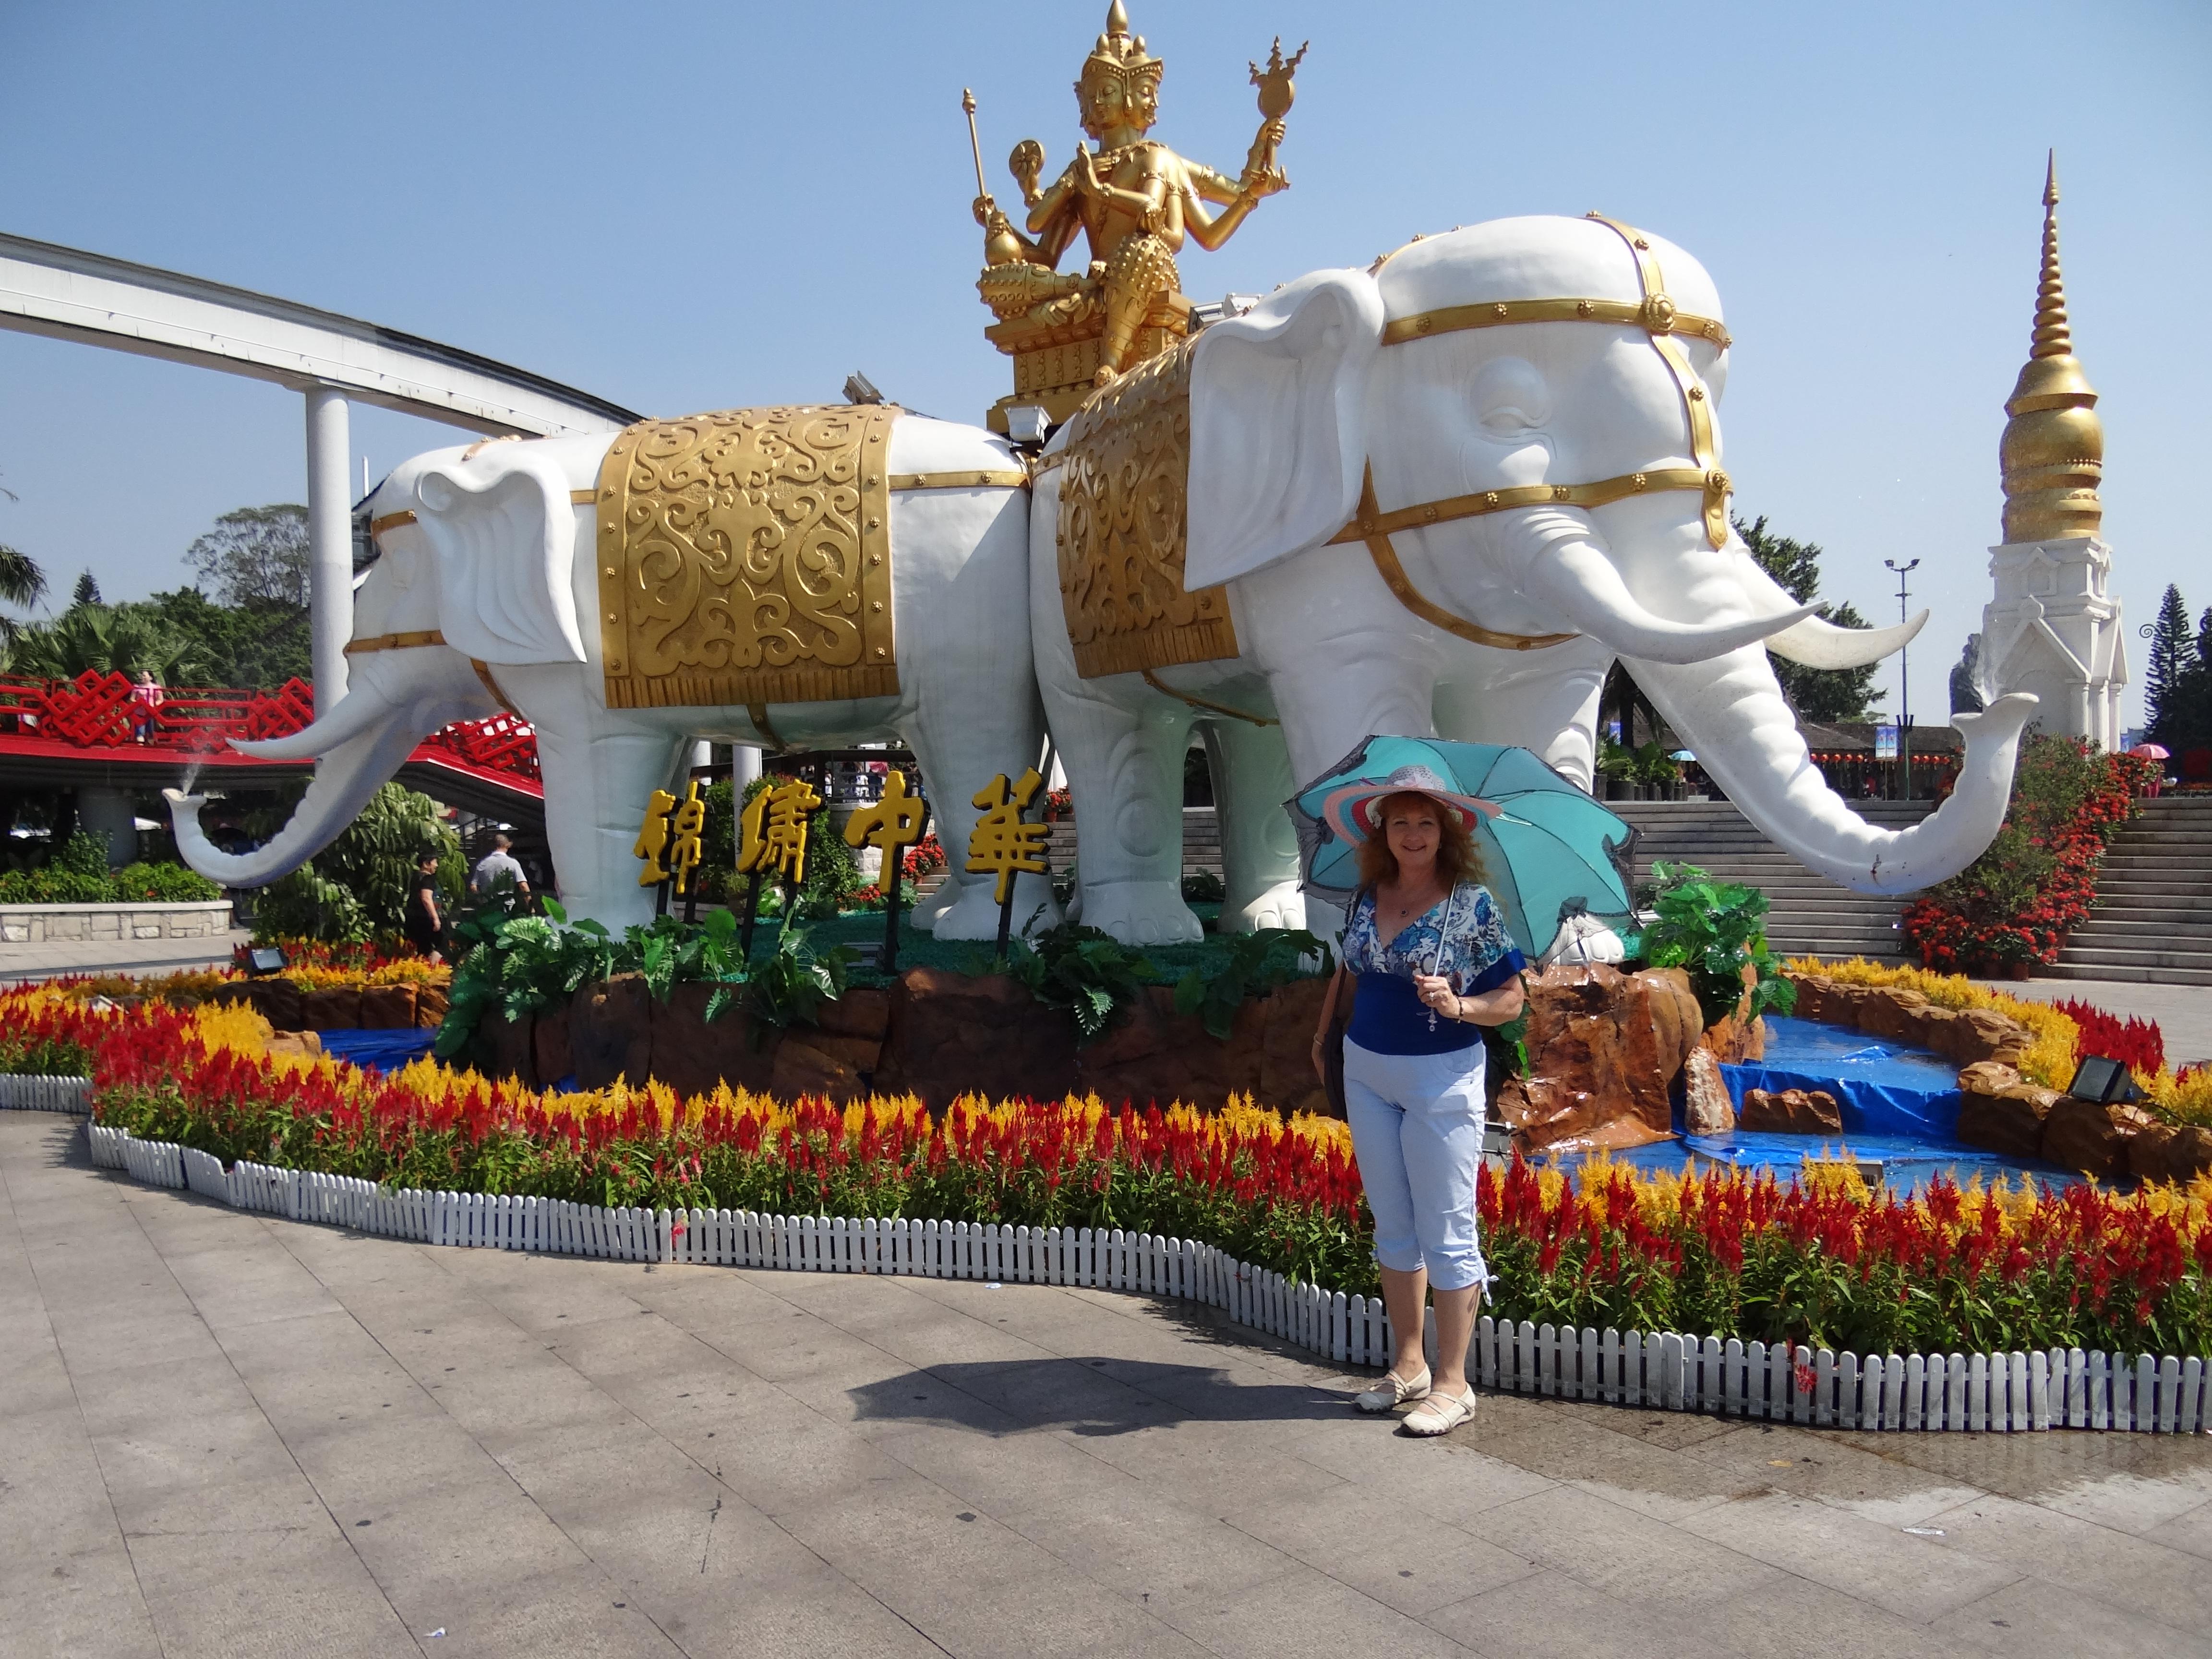 October 6 Miniature China And China Folk Cultural Villages